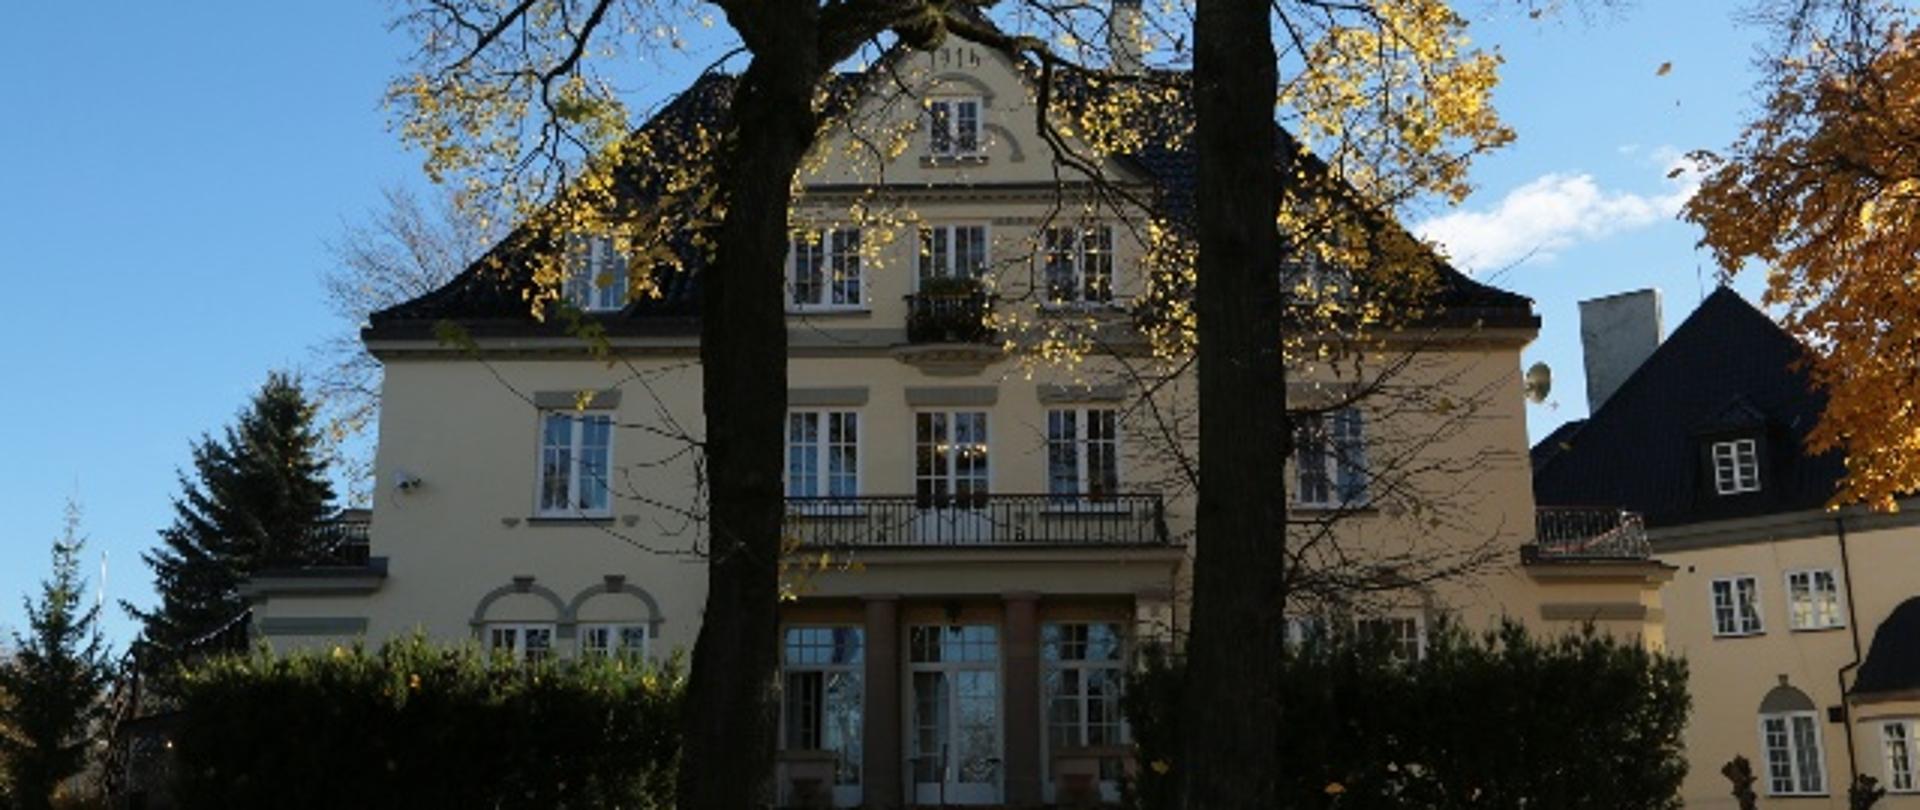 Ambasada W Oslo